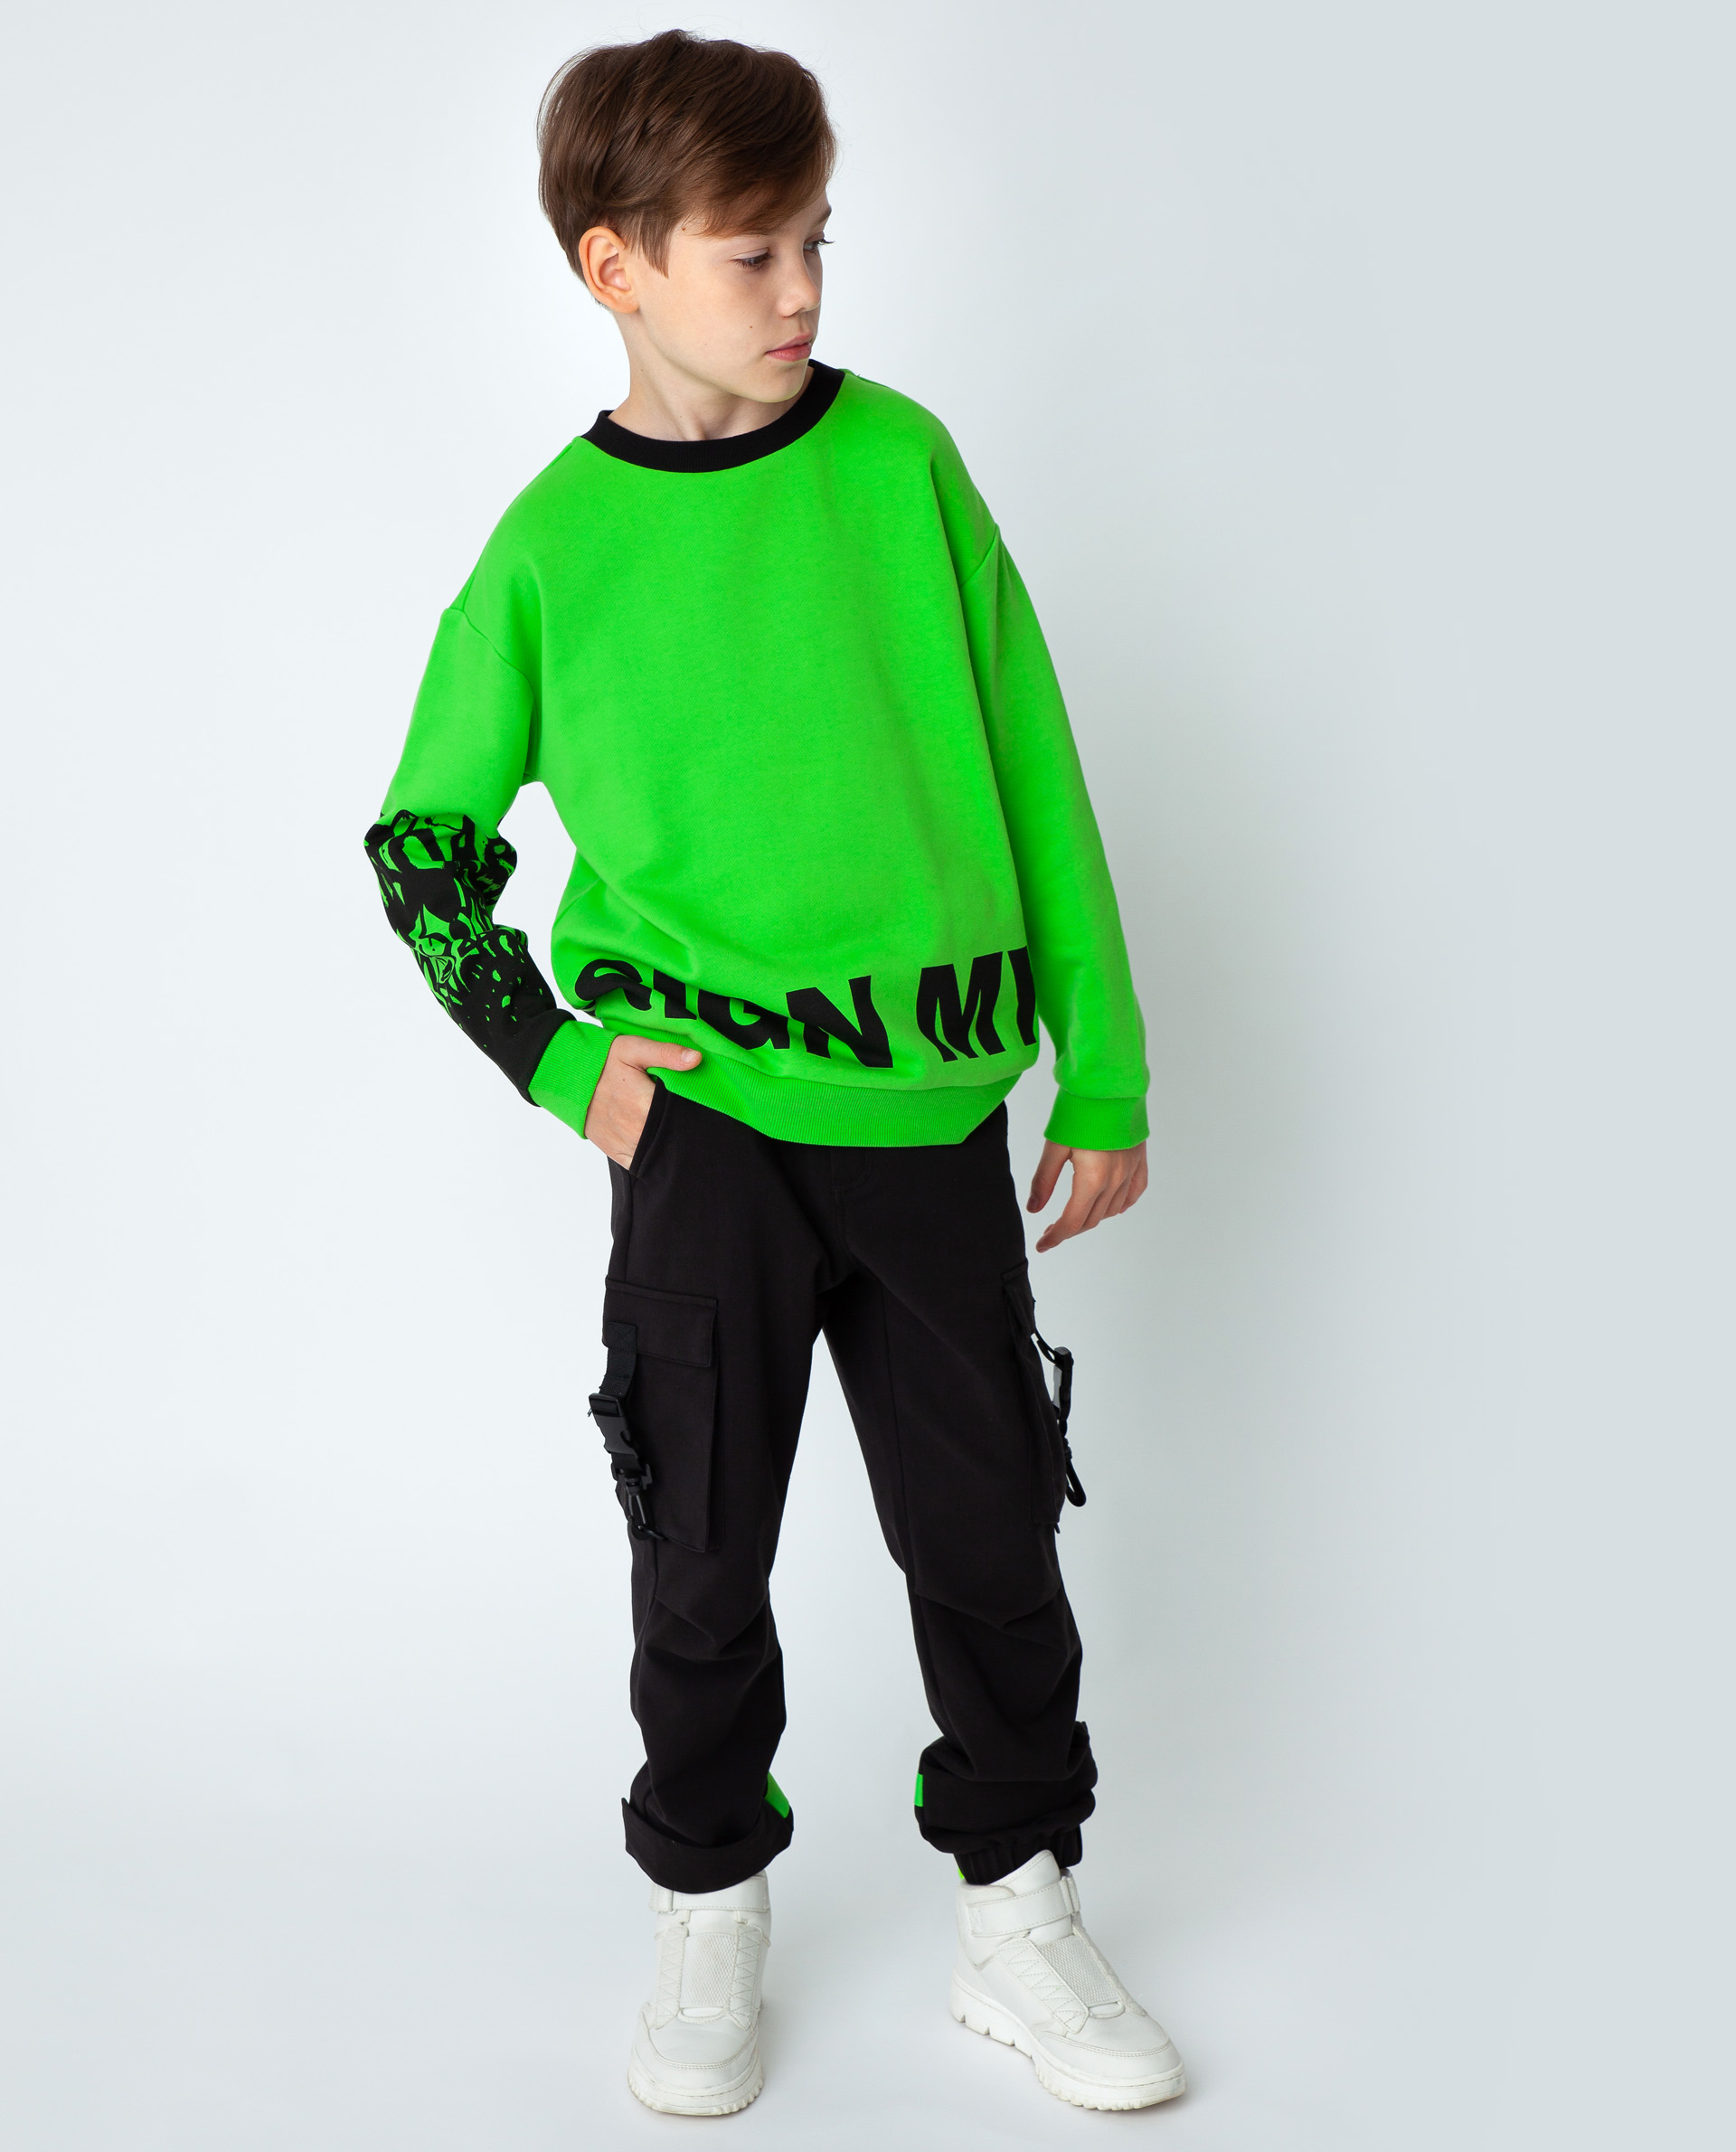 Купить 22012BJC1607, Зеленая толстовка Gulliver, зеленый, 170, Футер, Мужской, Демисезон, ОСЕНЬ/ЗИМА 2020-2021 (shop: GulliverMarket Gulliver Market)